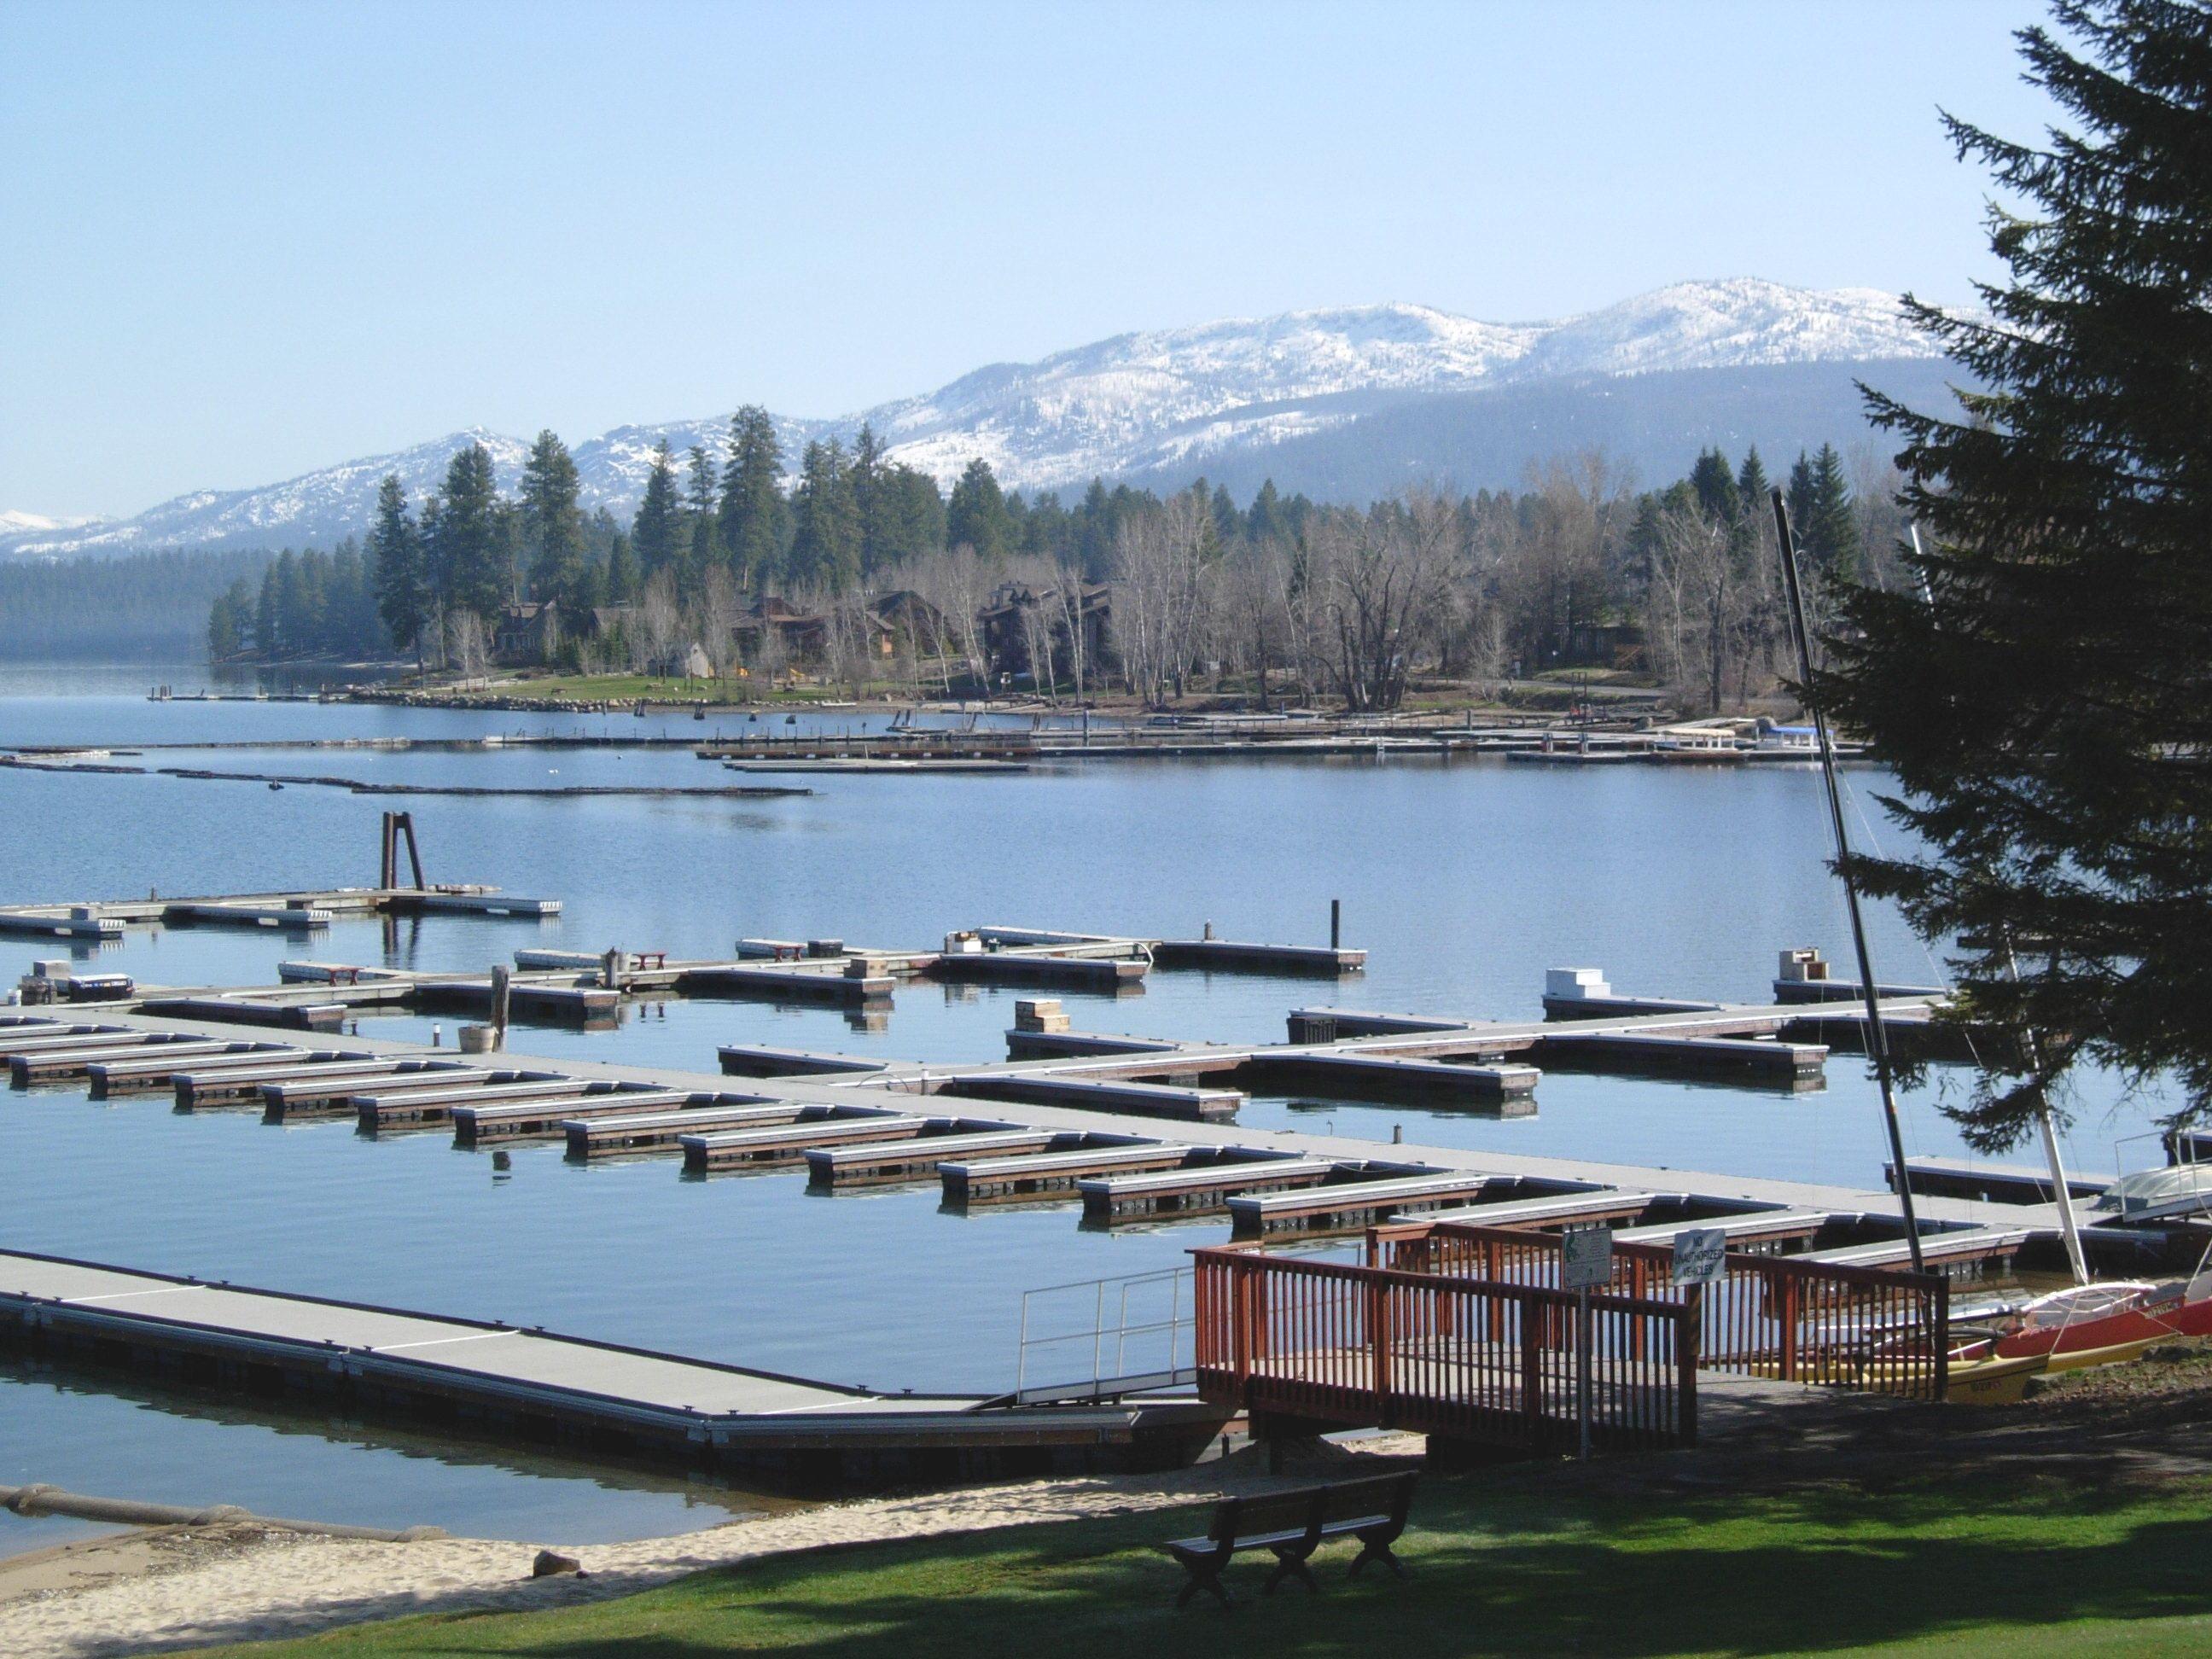 Great Lake Vacations: 5 Northwest Waterworlds Kids Will Love